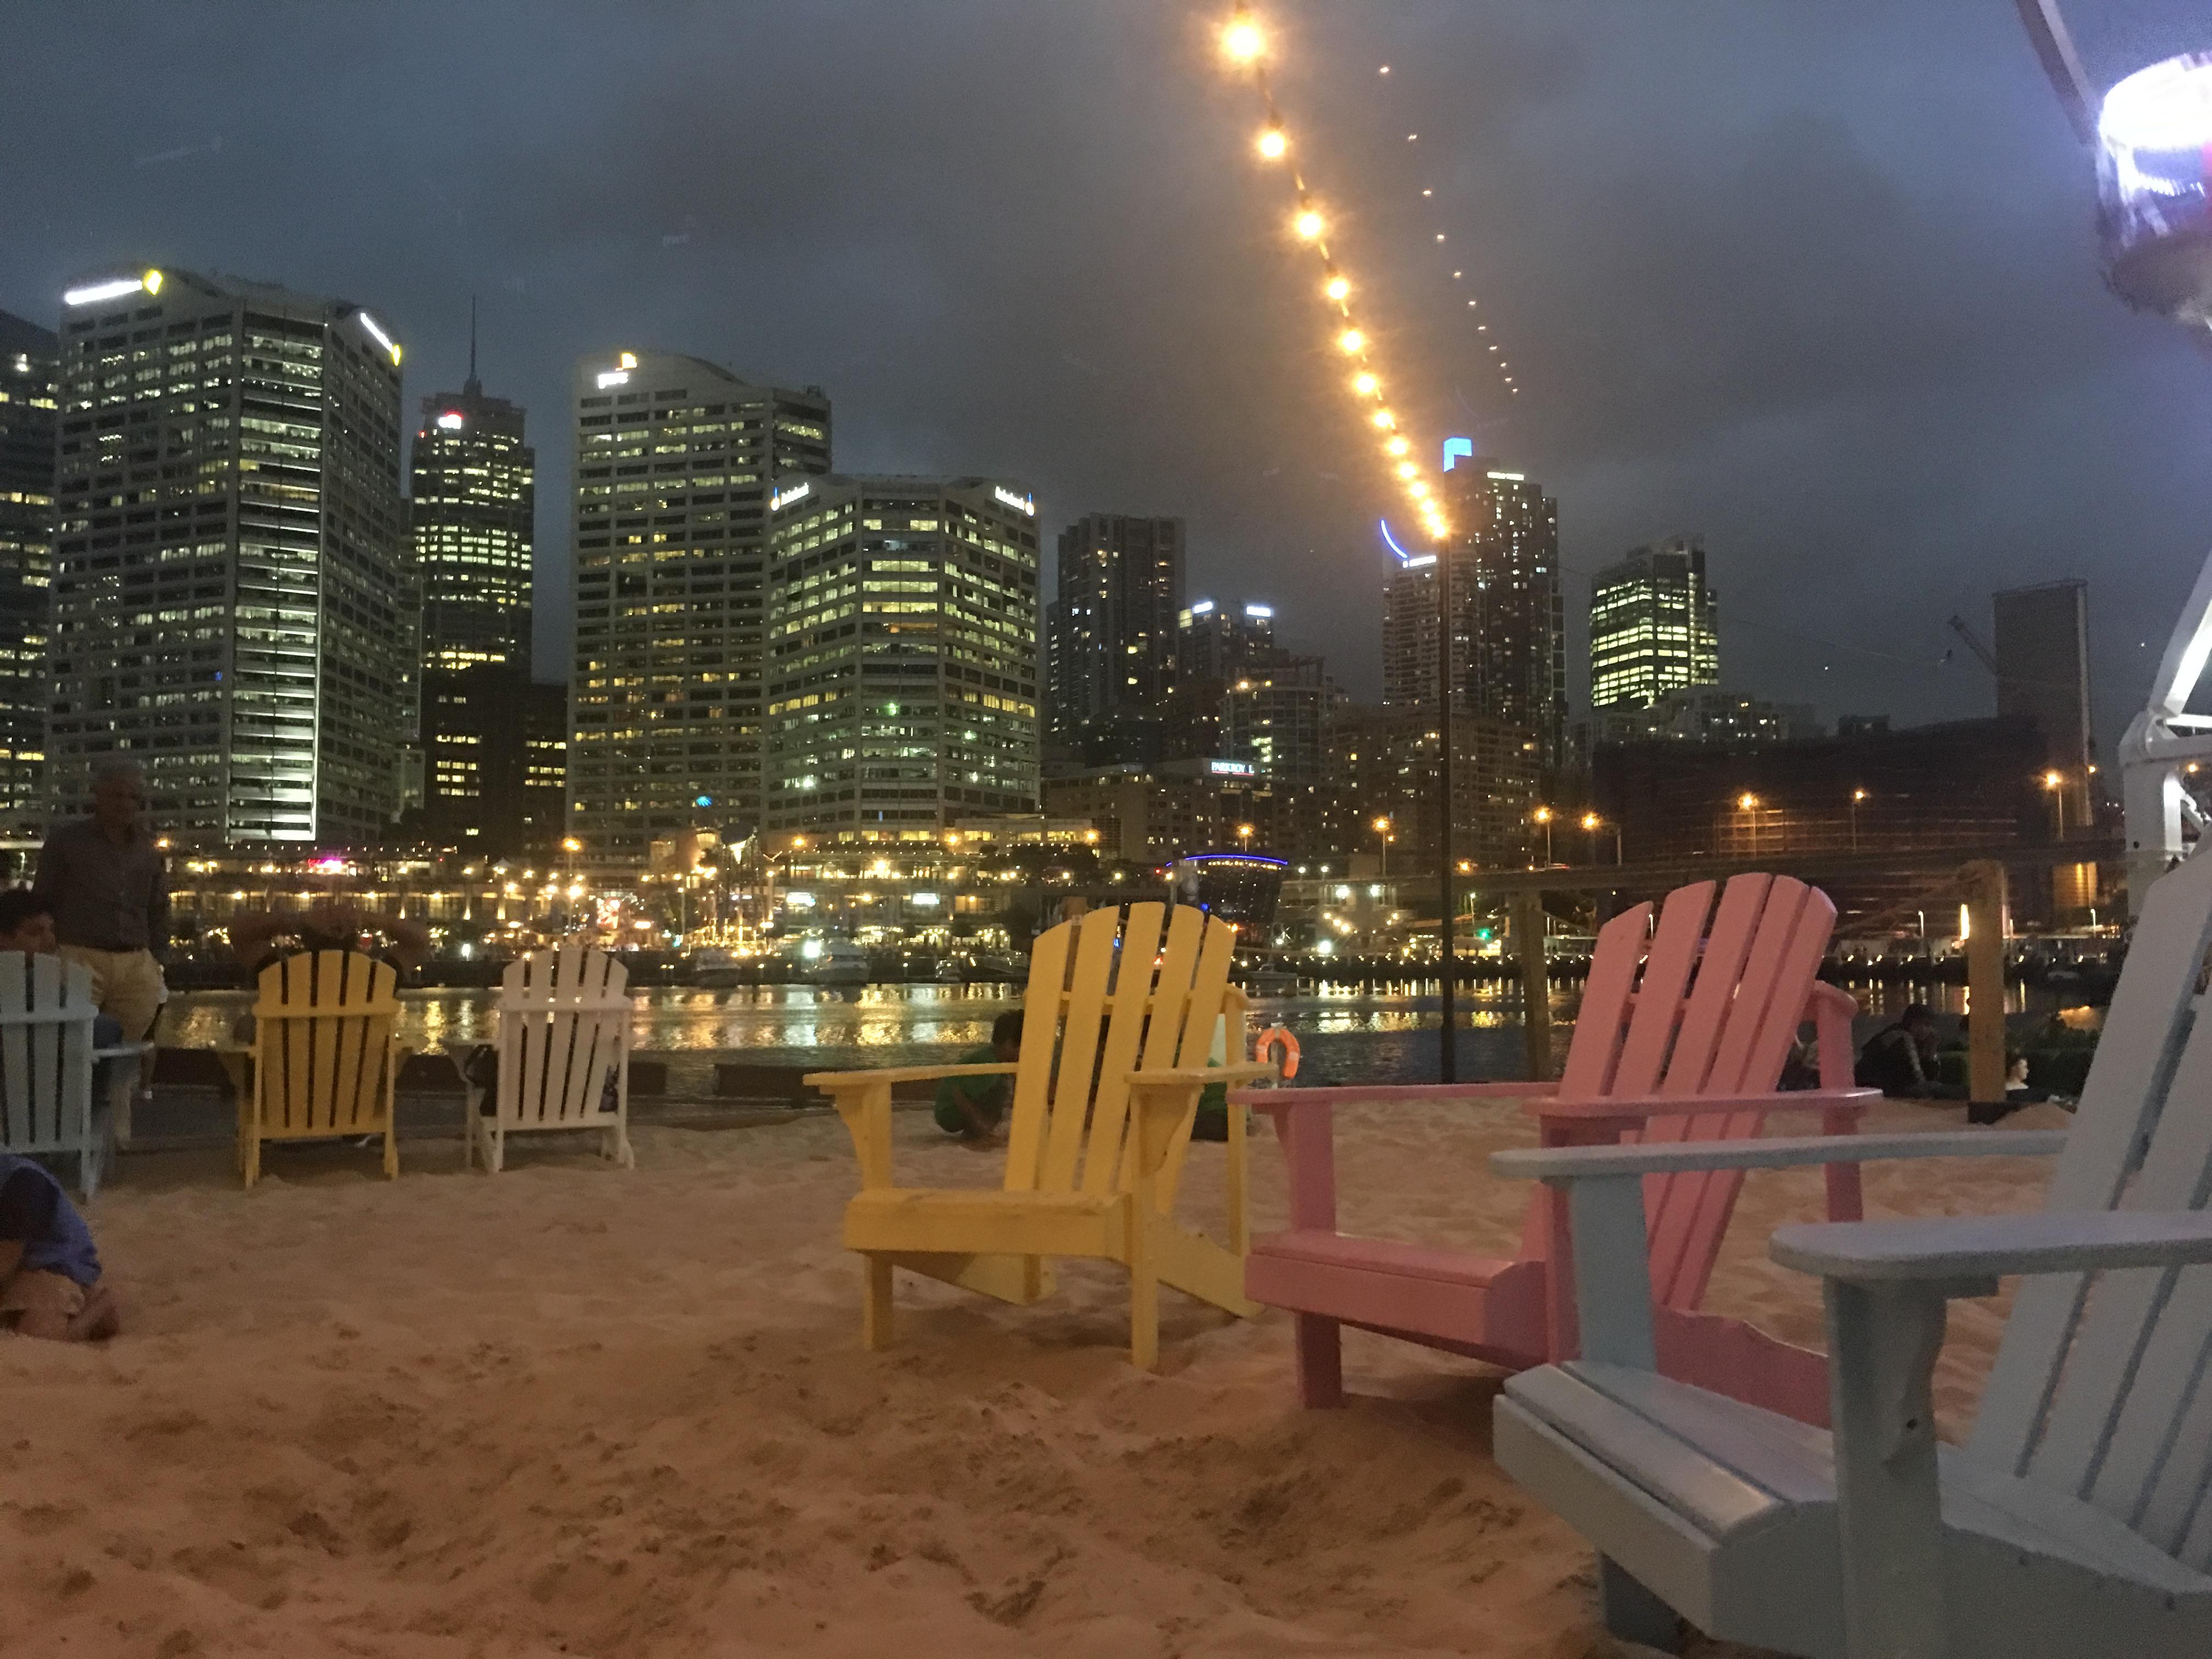 CAPAStudyAbroad_Sydney_Spring2017_From Colin Gilbert - Arrivals1.jpg